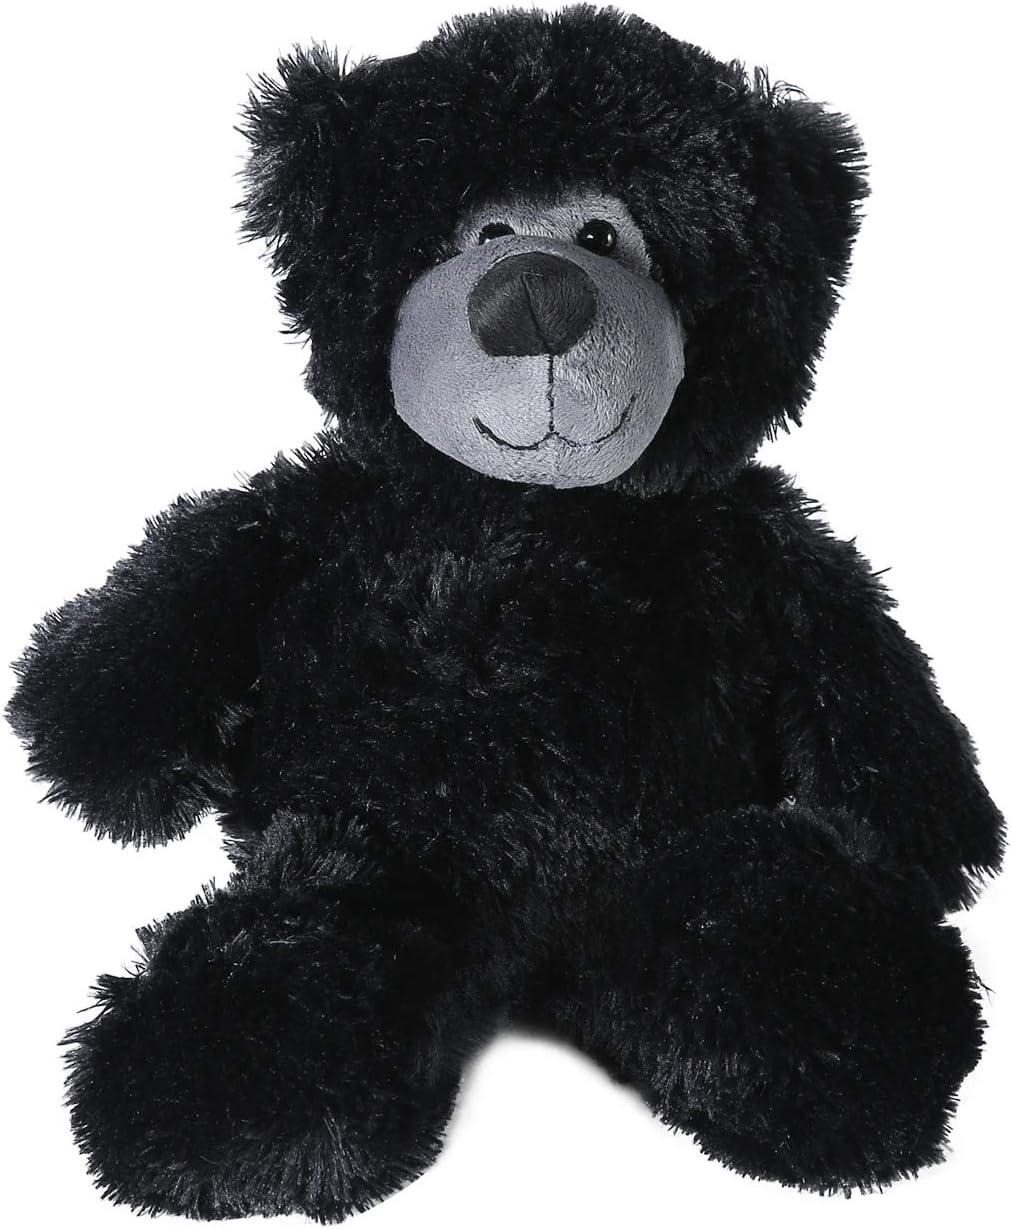 AMERLL In stock Soft Teddy Bear Stuffed Virginia Beach Mall Plush Durable Animal